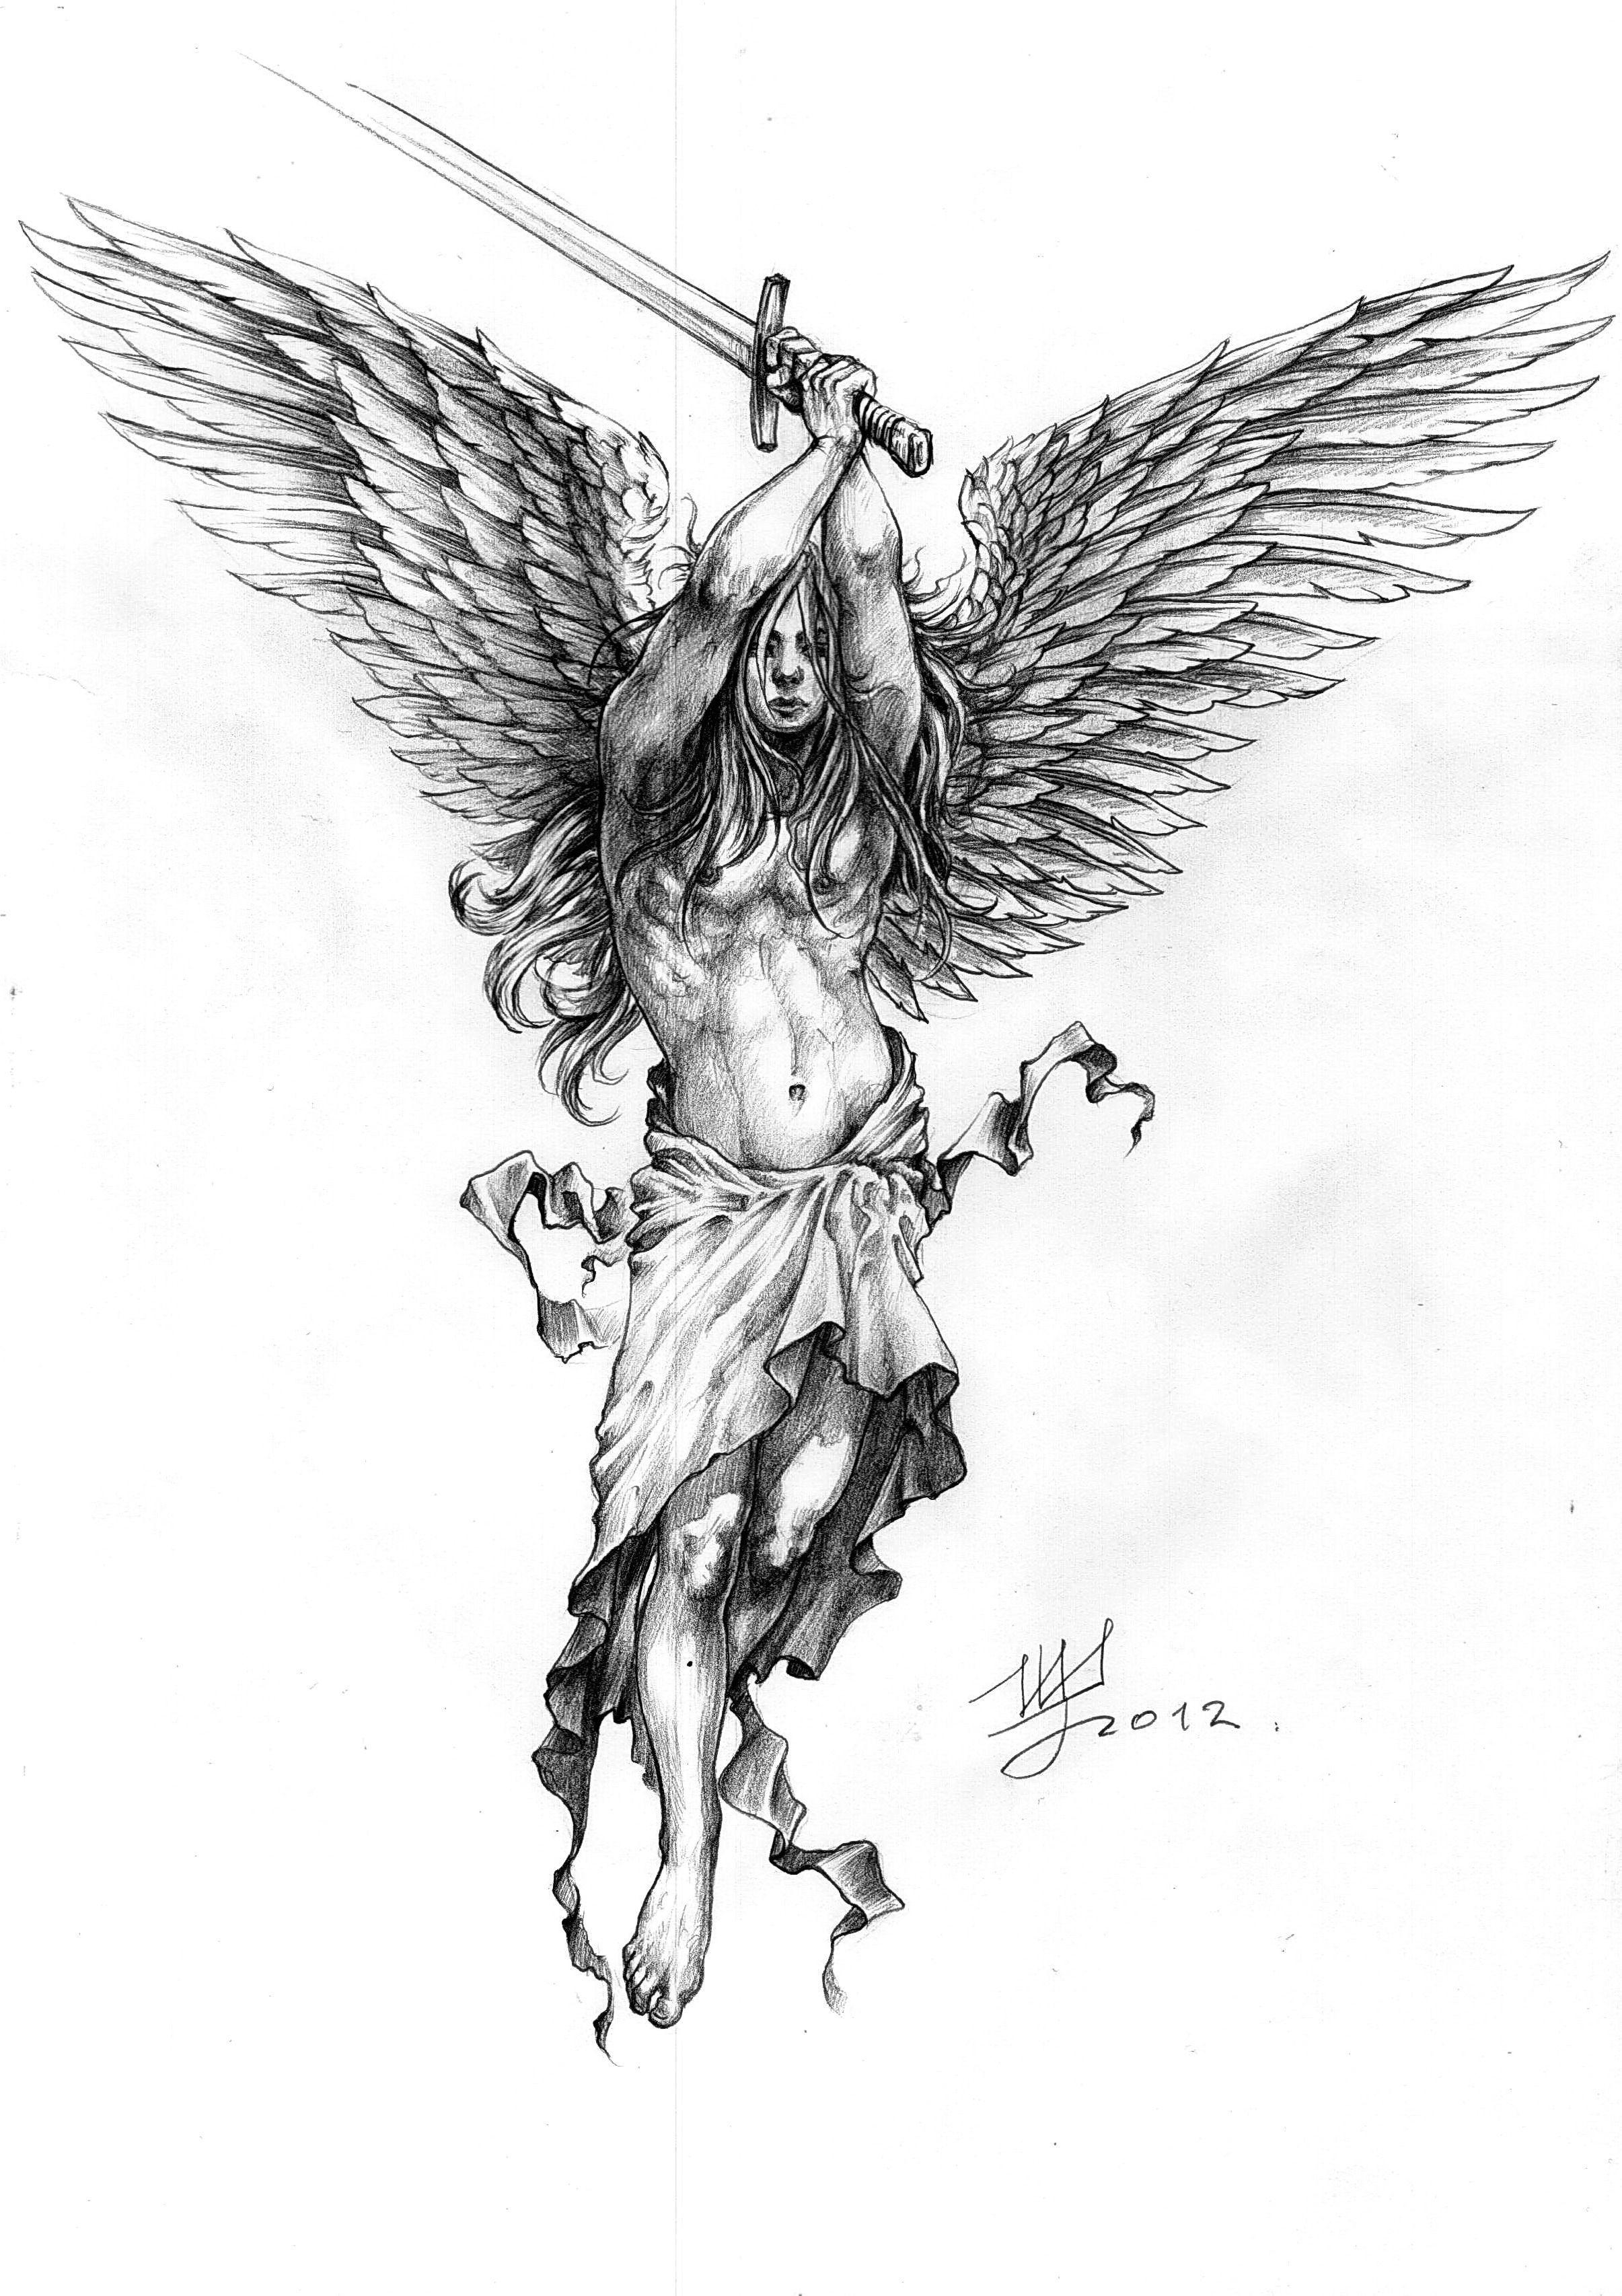 картинки архангелов для тату полюбят даже те